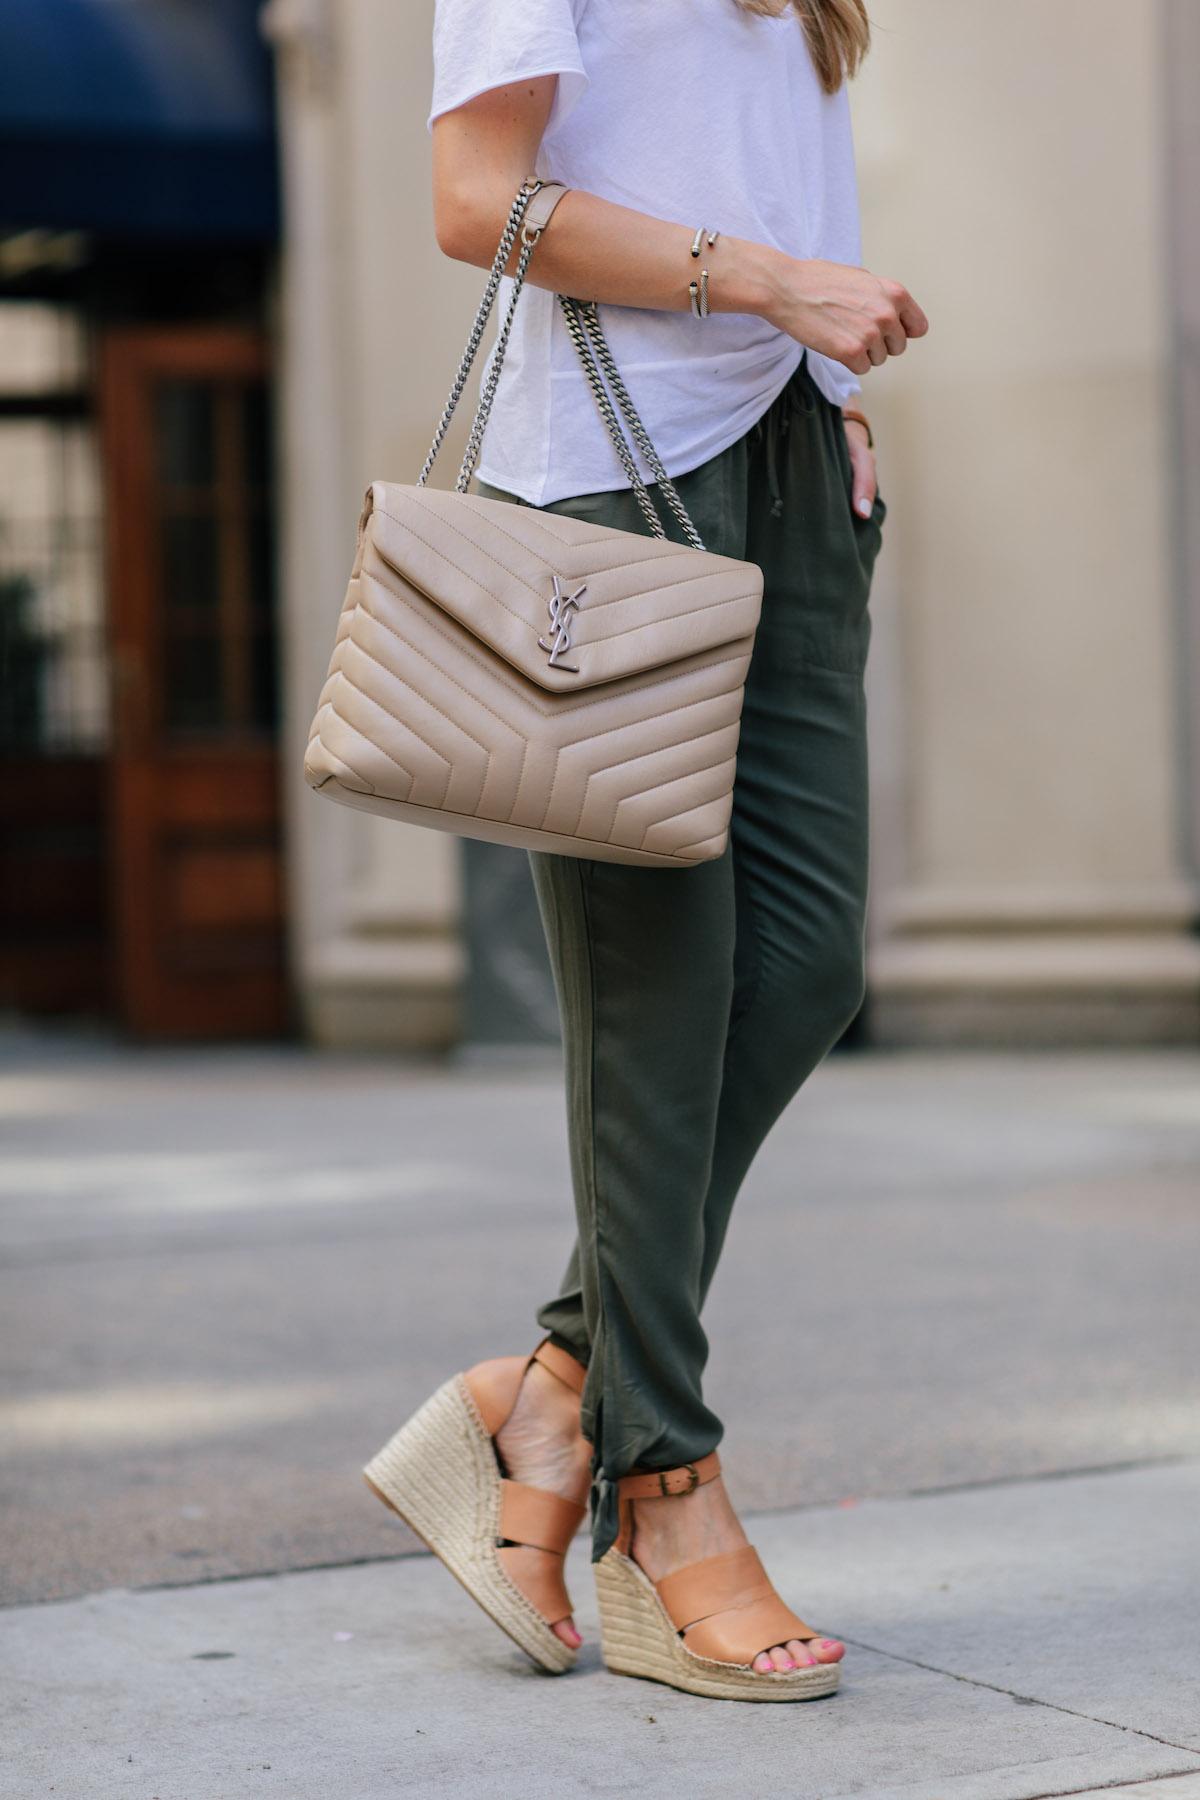 Saint Laurent LouLou Medium Chain Bag